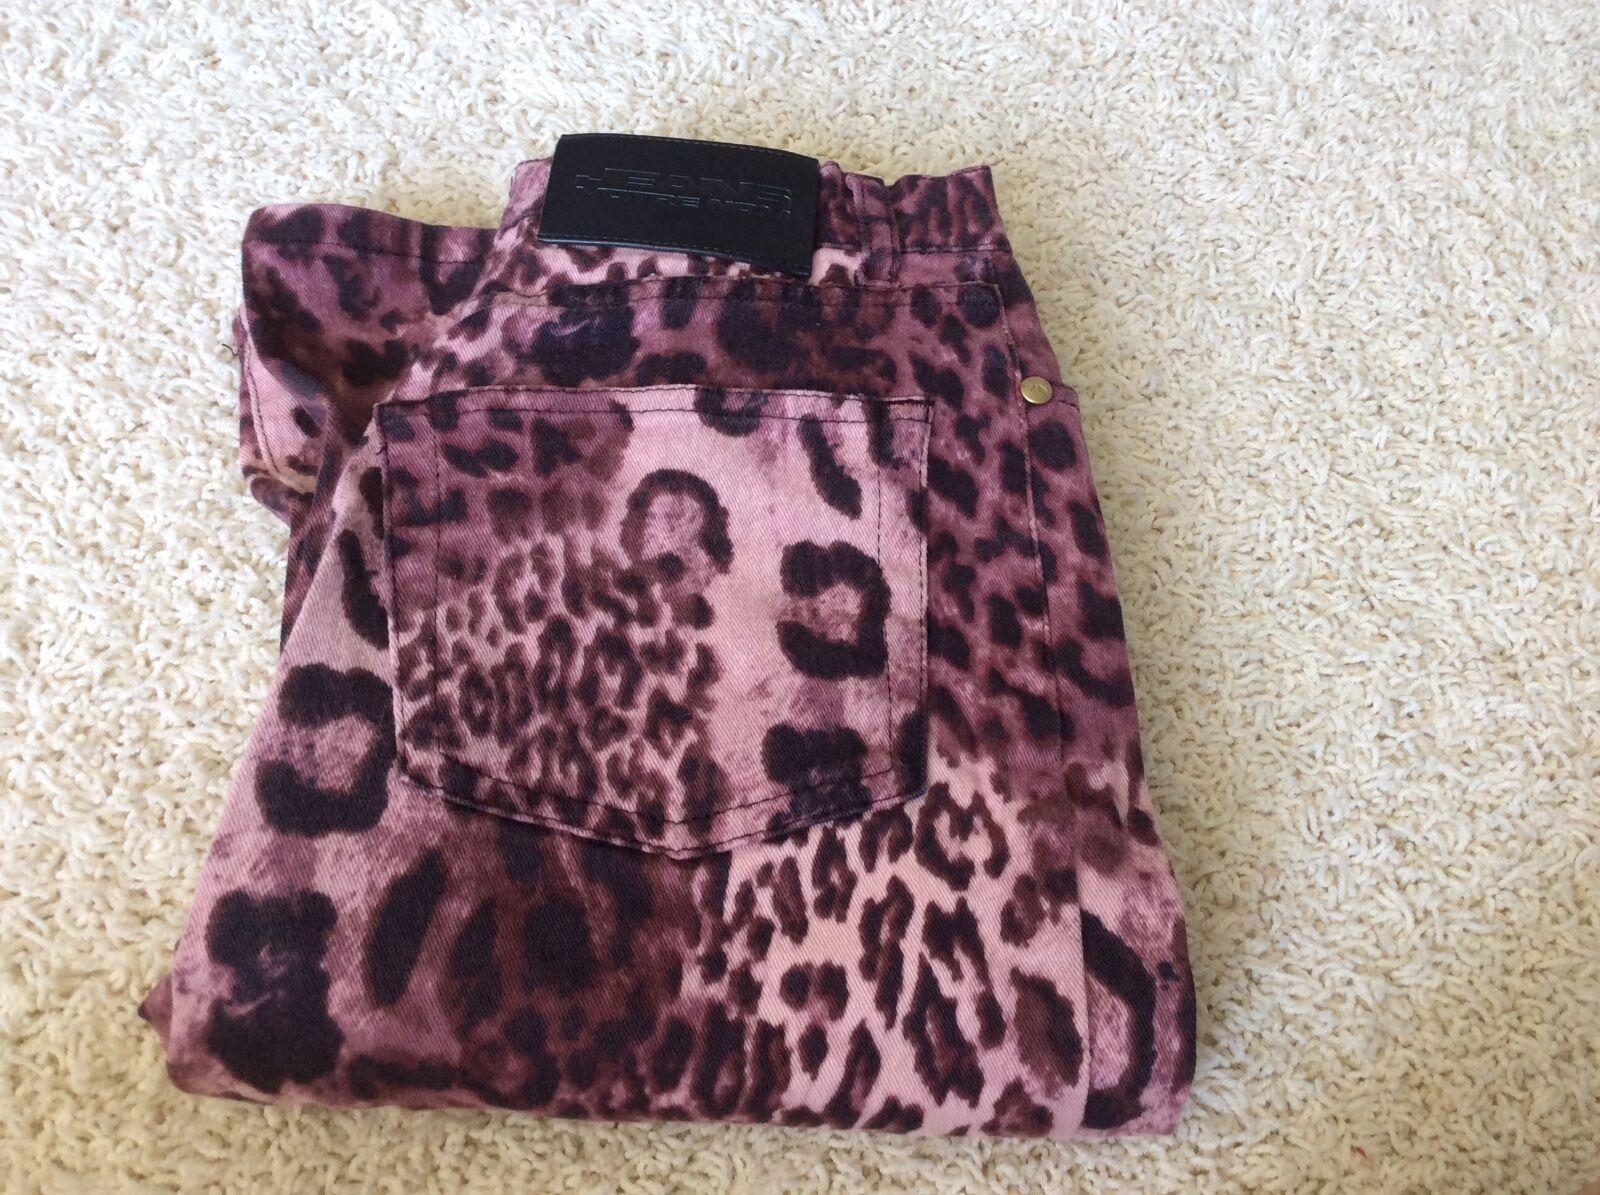 Votre Nom Jeans Cotton Spandex Purple  Denin Straight Waist Belt Loops Small